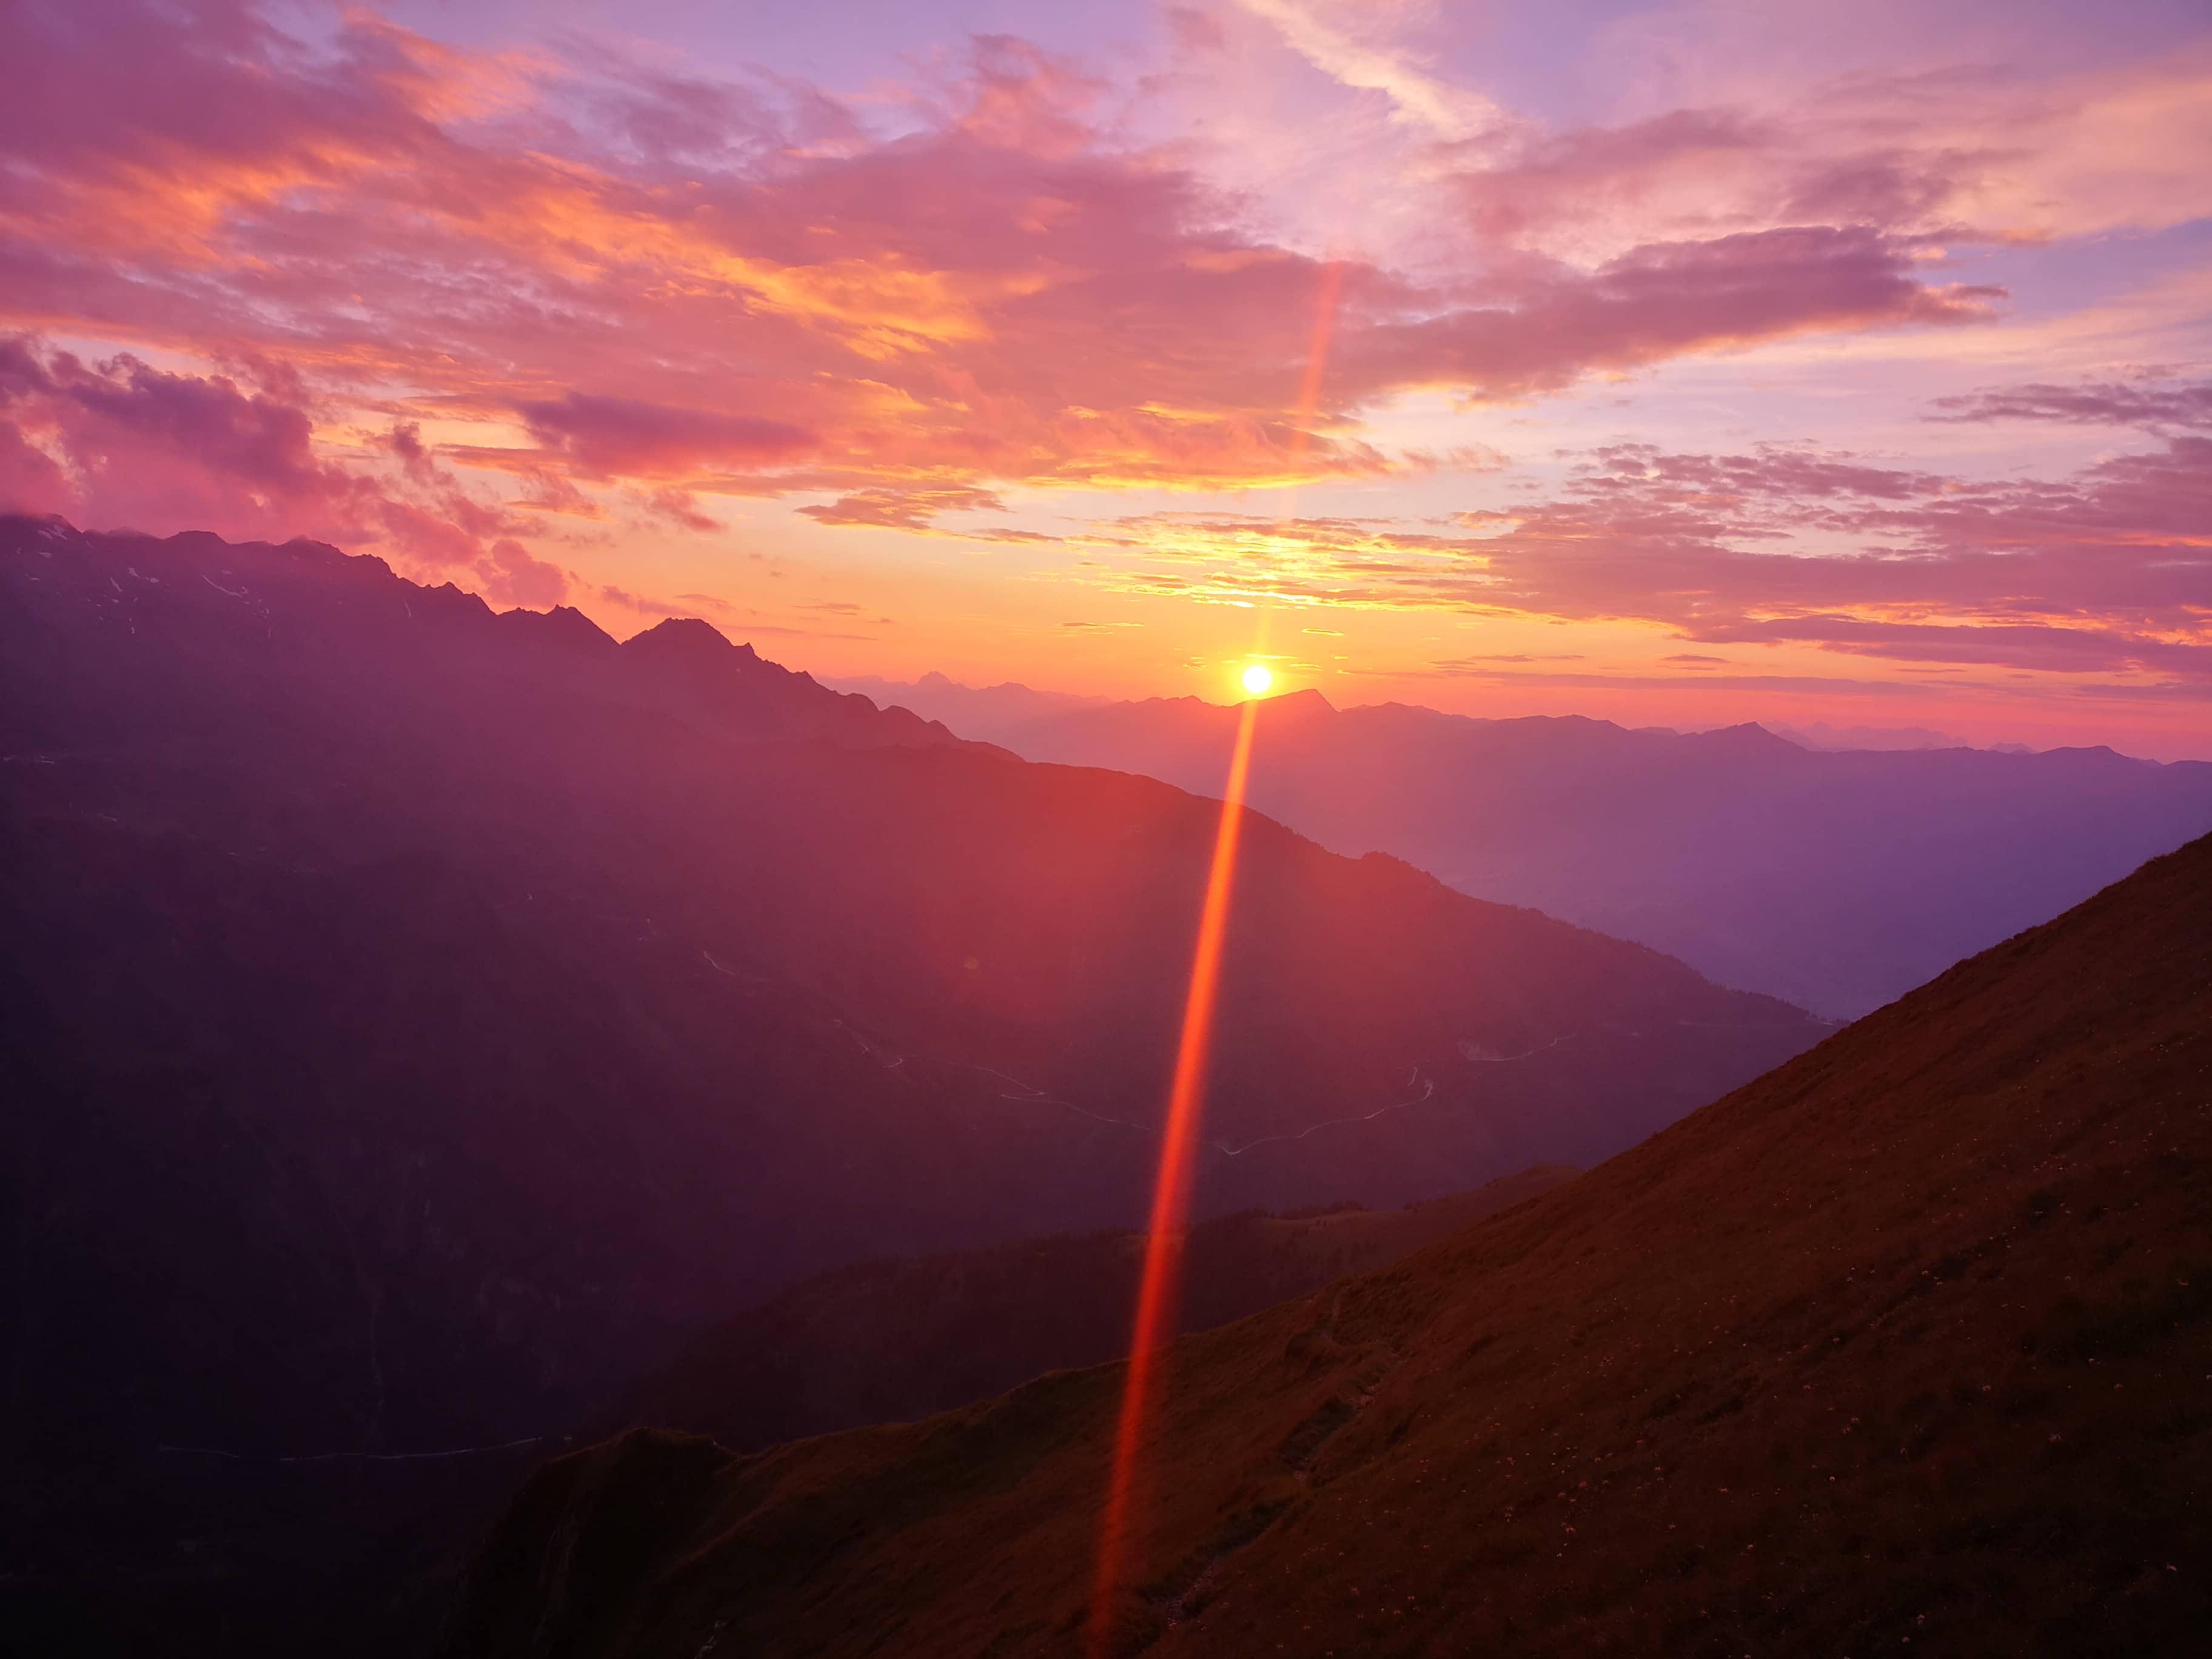 Sonnenuntergang beim Trailrunning in Kaprun